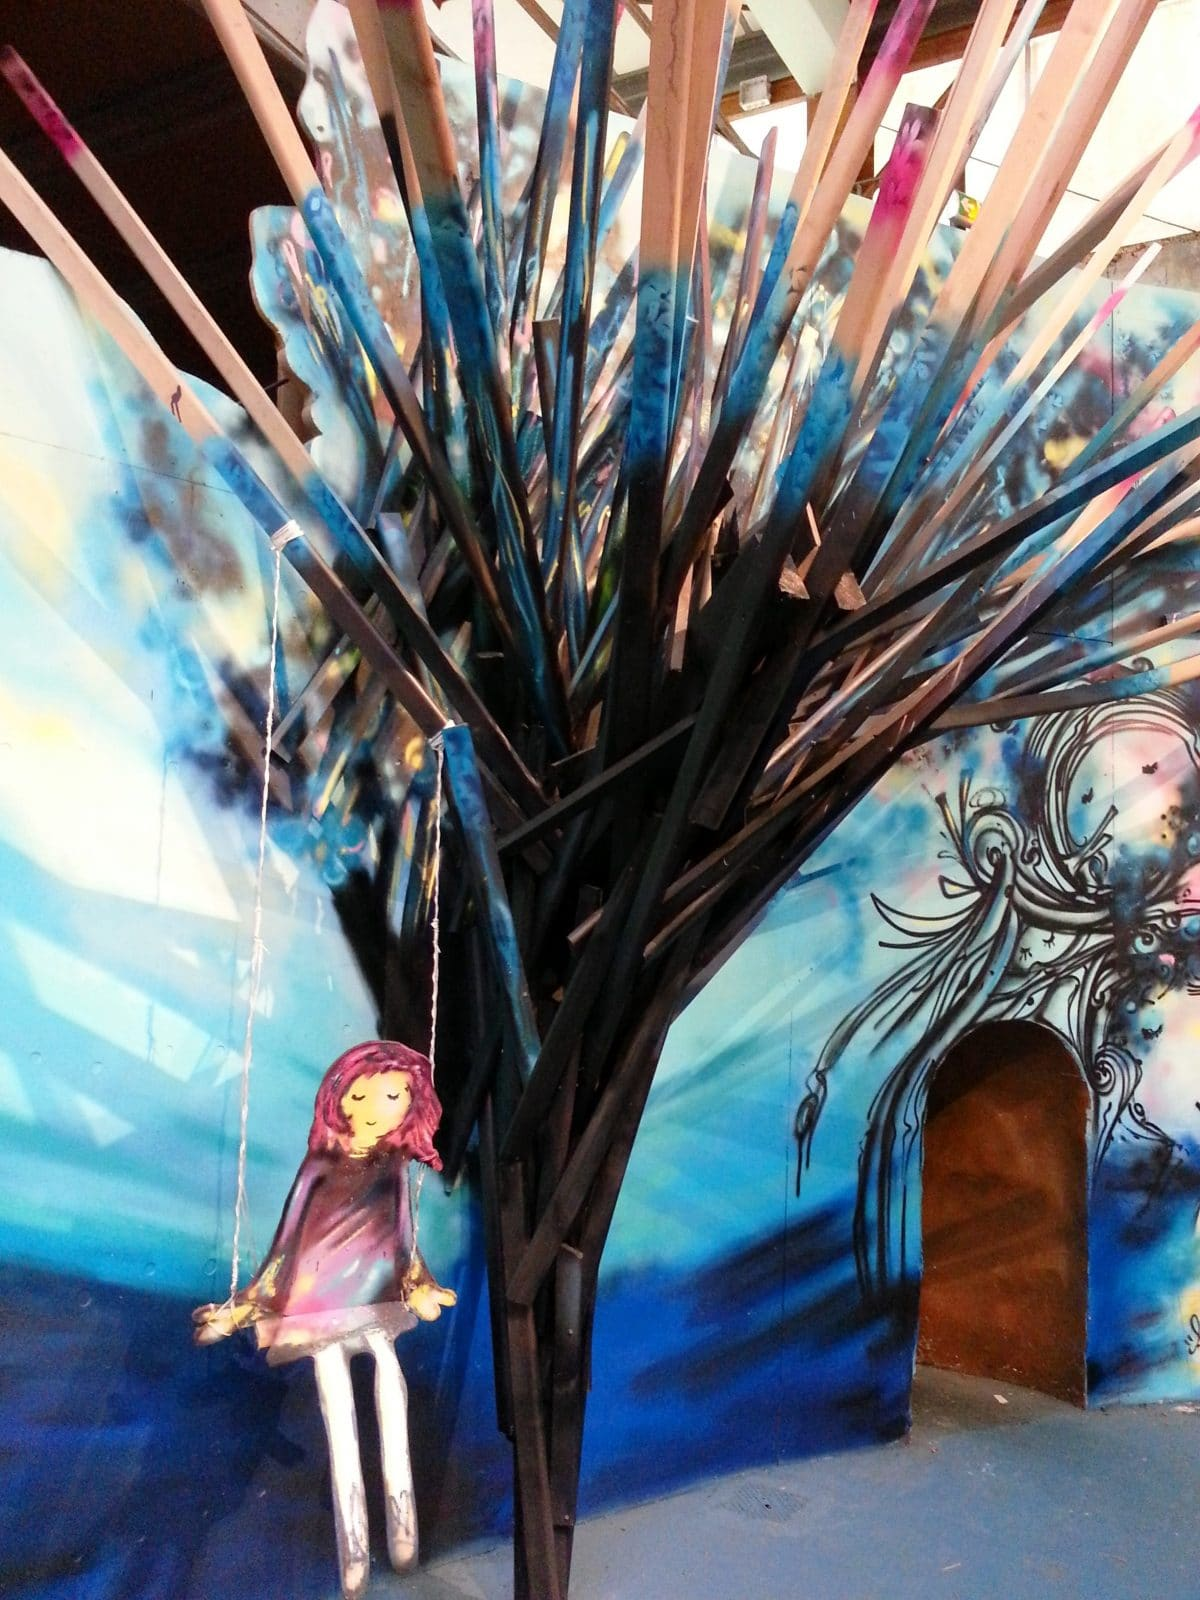 anis l'arbre enchanté street art la réserve malakoff